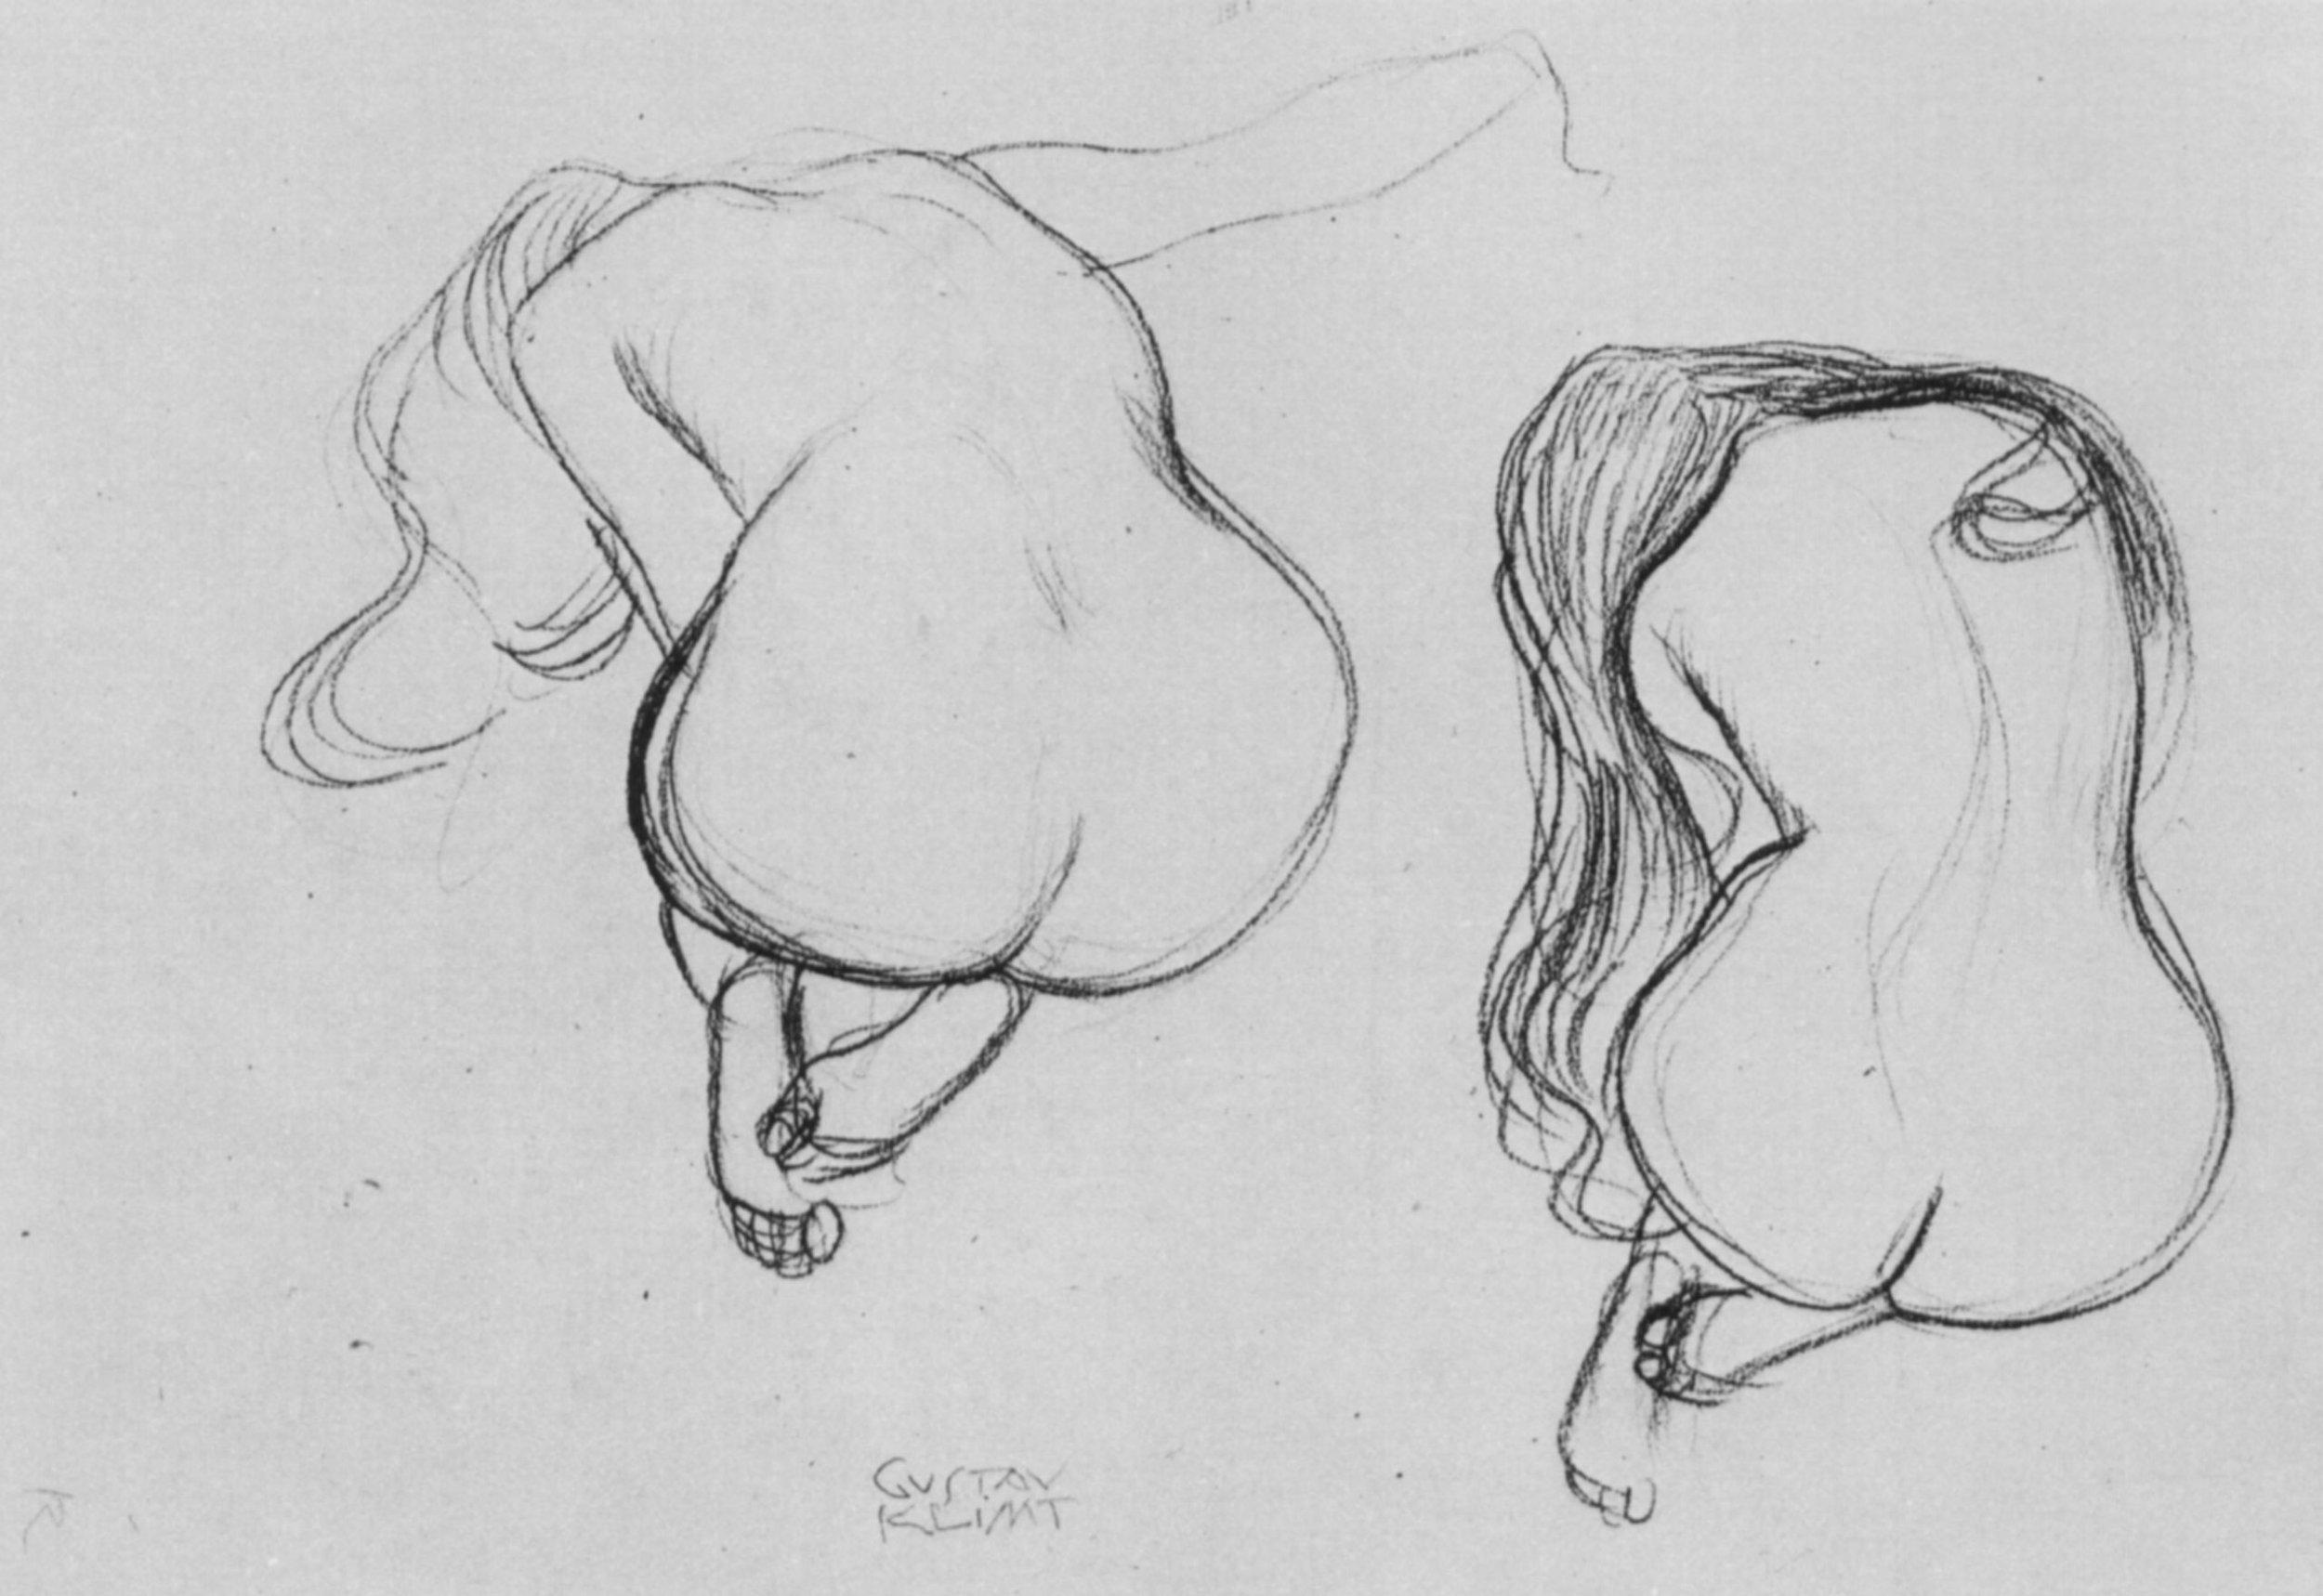 19o2  Gustav Klimt  /   Two Studies of Sitting Nudes   .